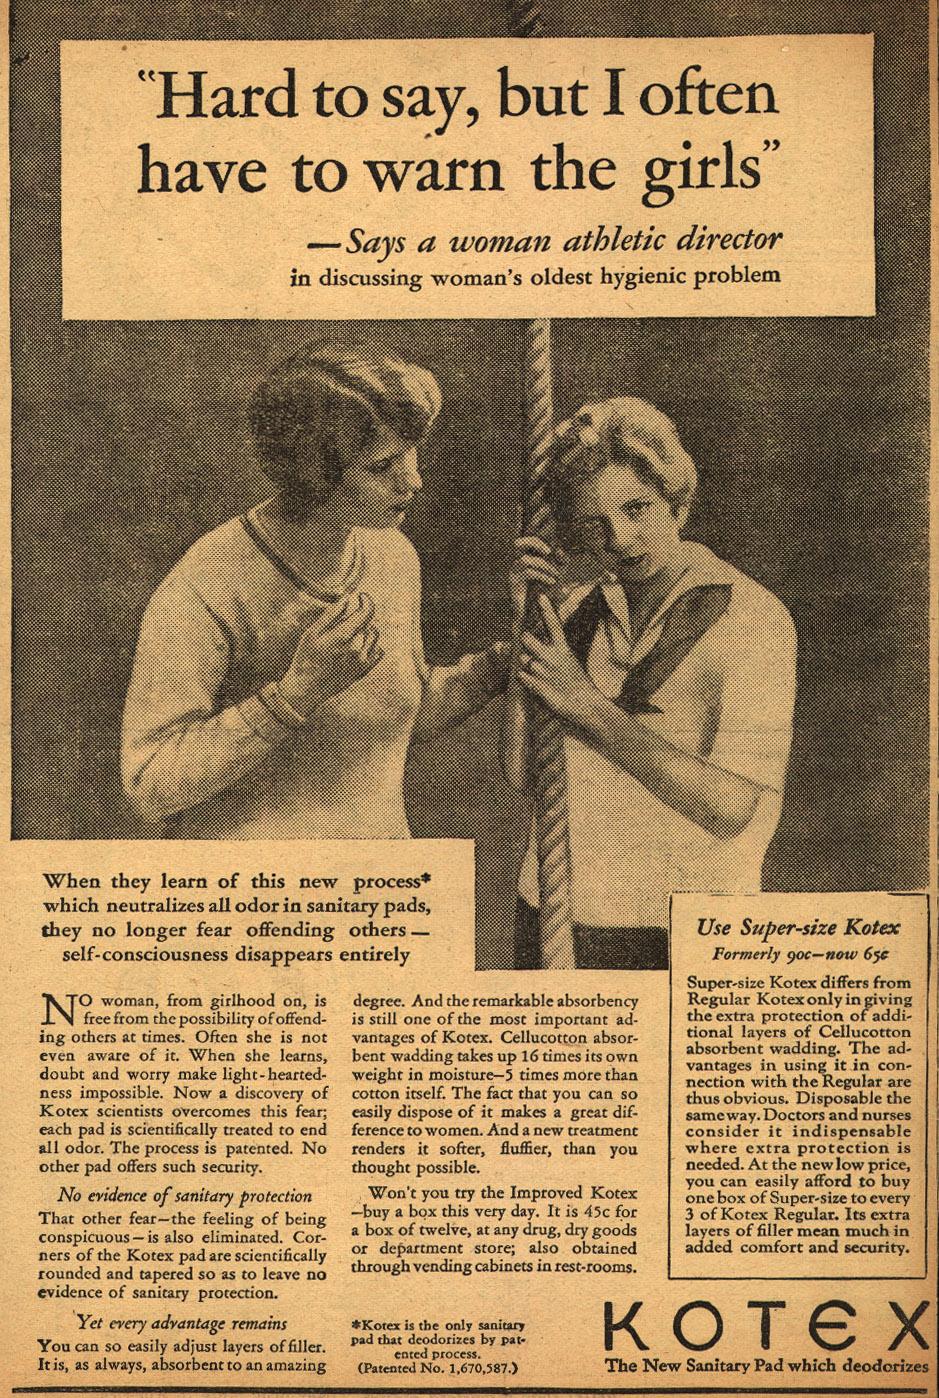 1929 Kotex advertisement. (Ad*Access, Duke University)